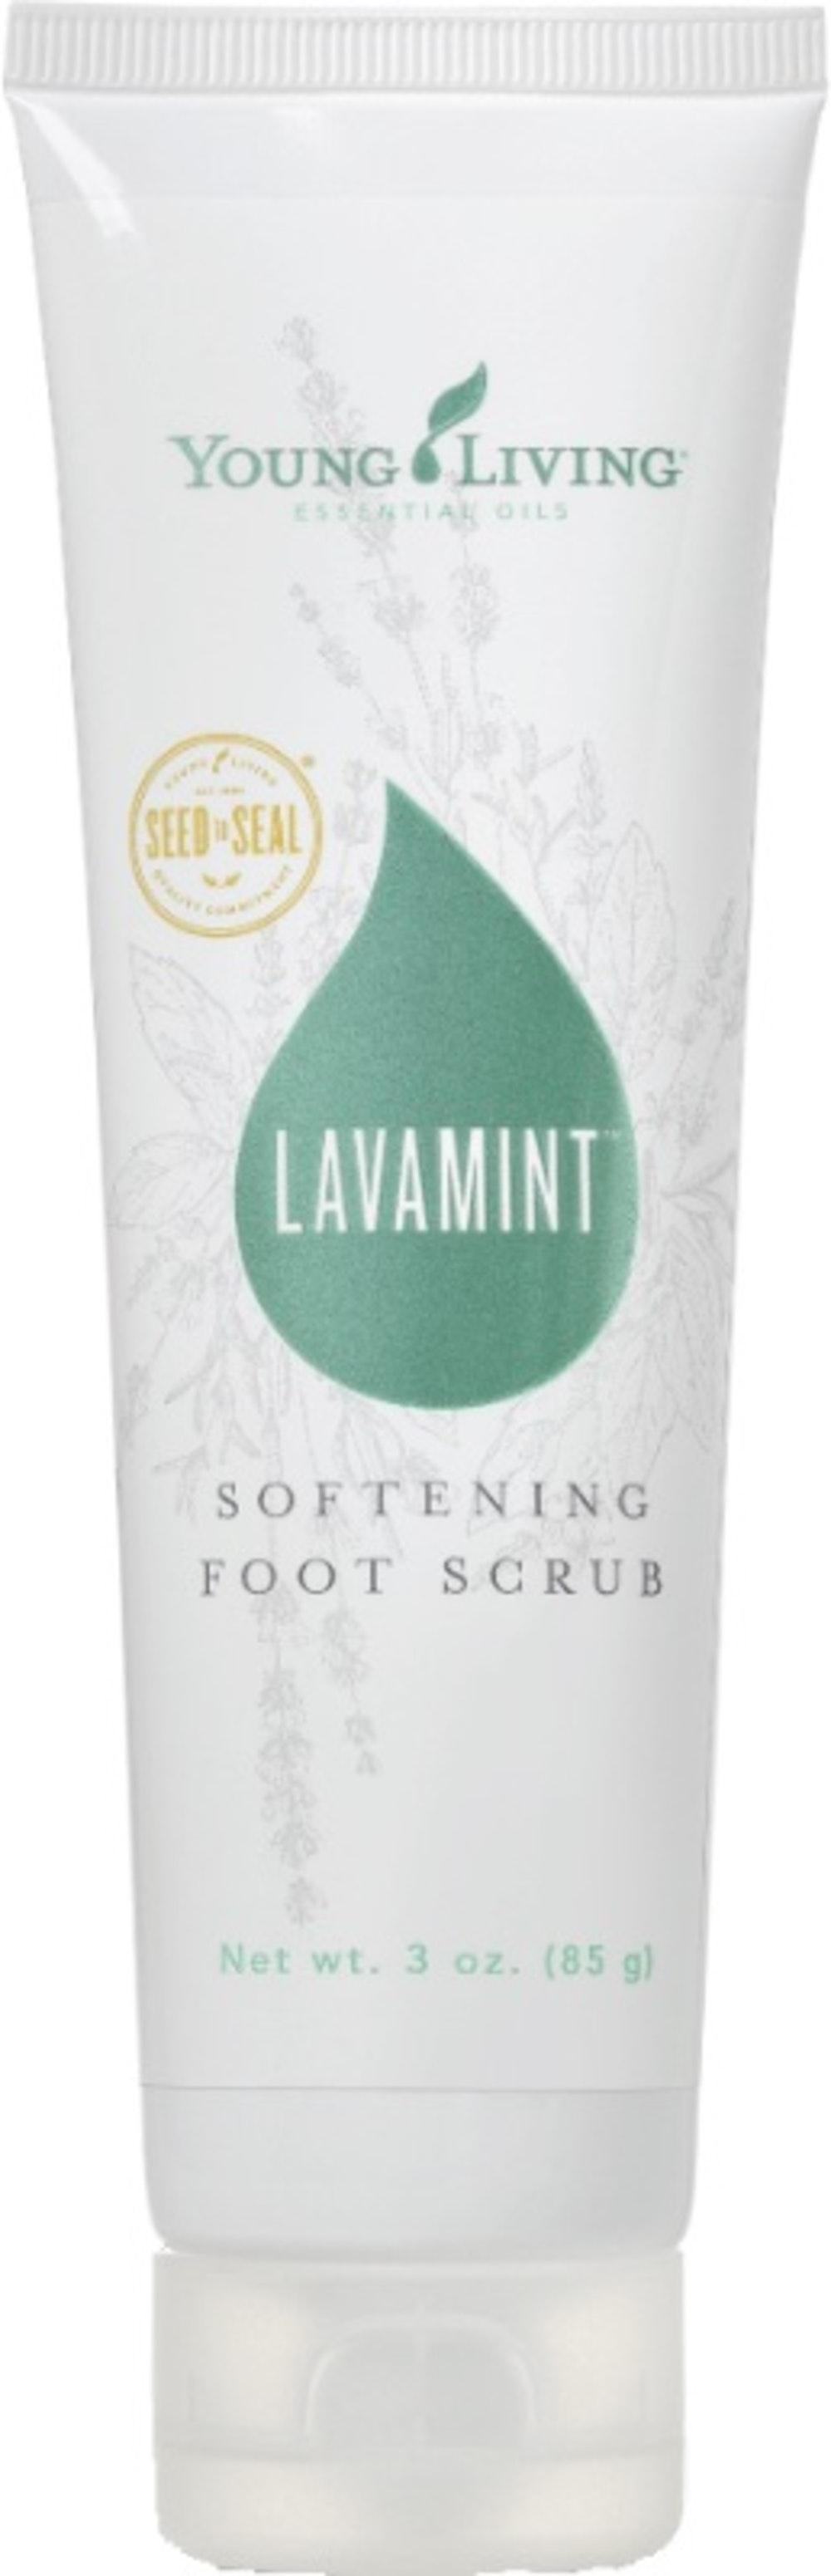 Lavamint Softening Foot Scrub